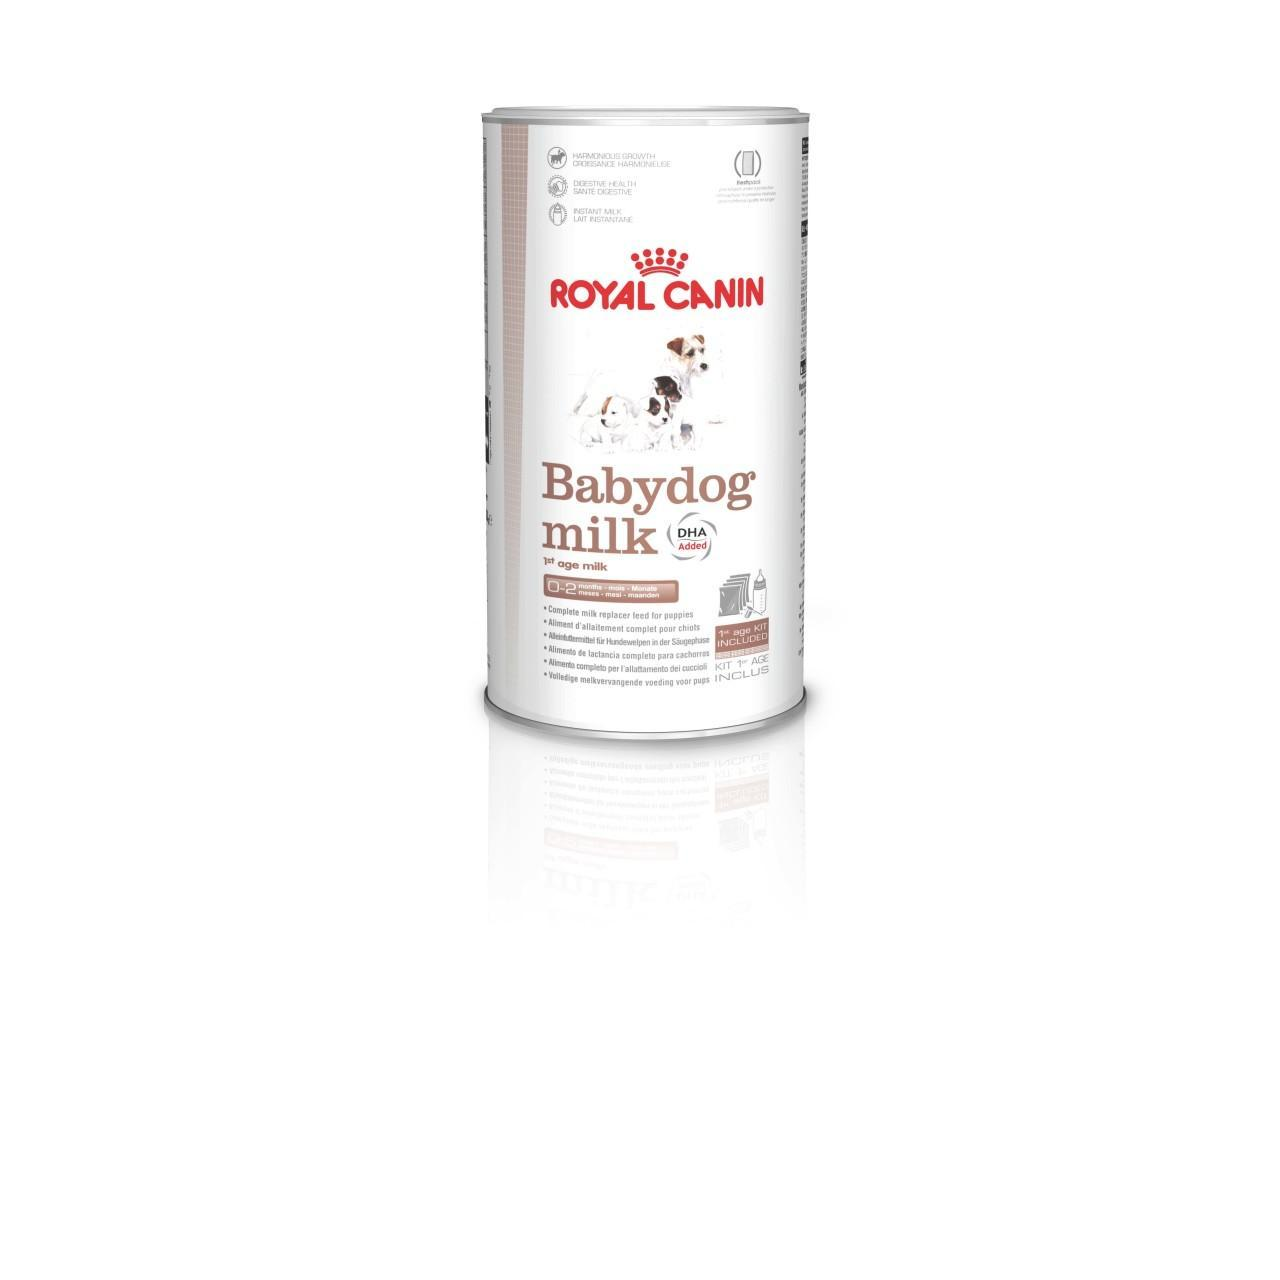 An image of Royal Canin Babydog Milk